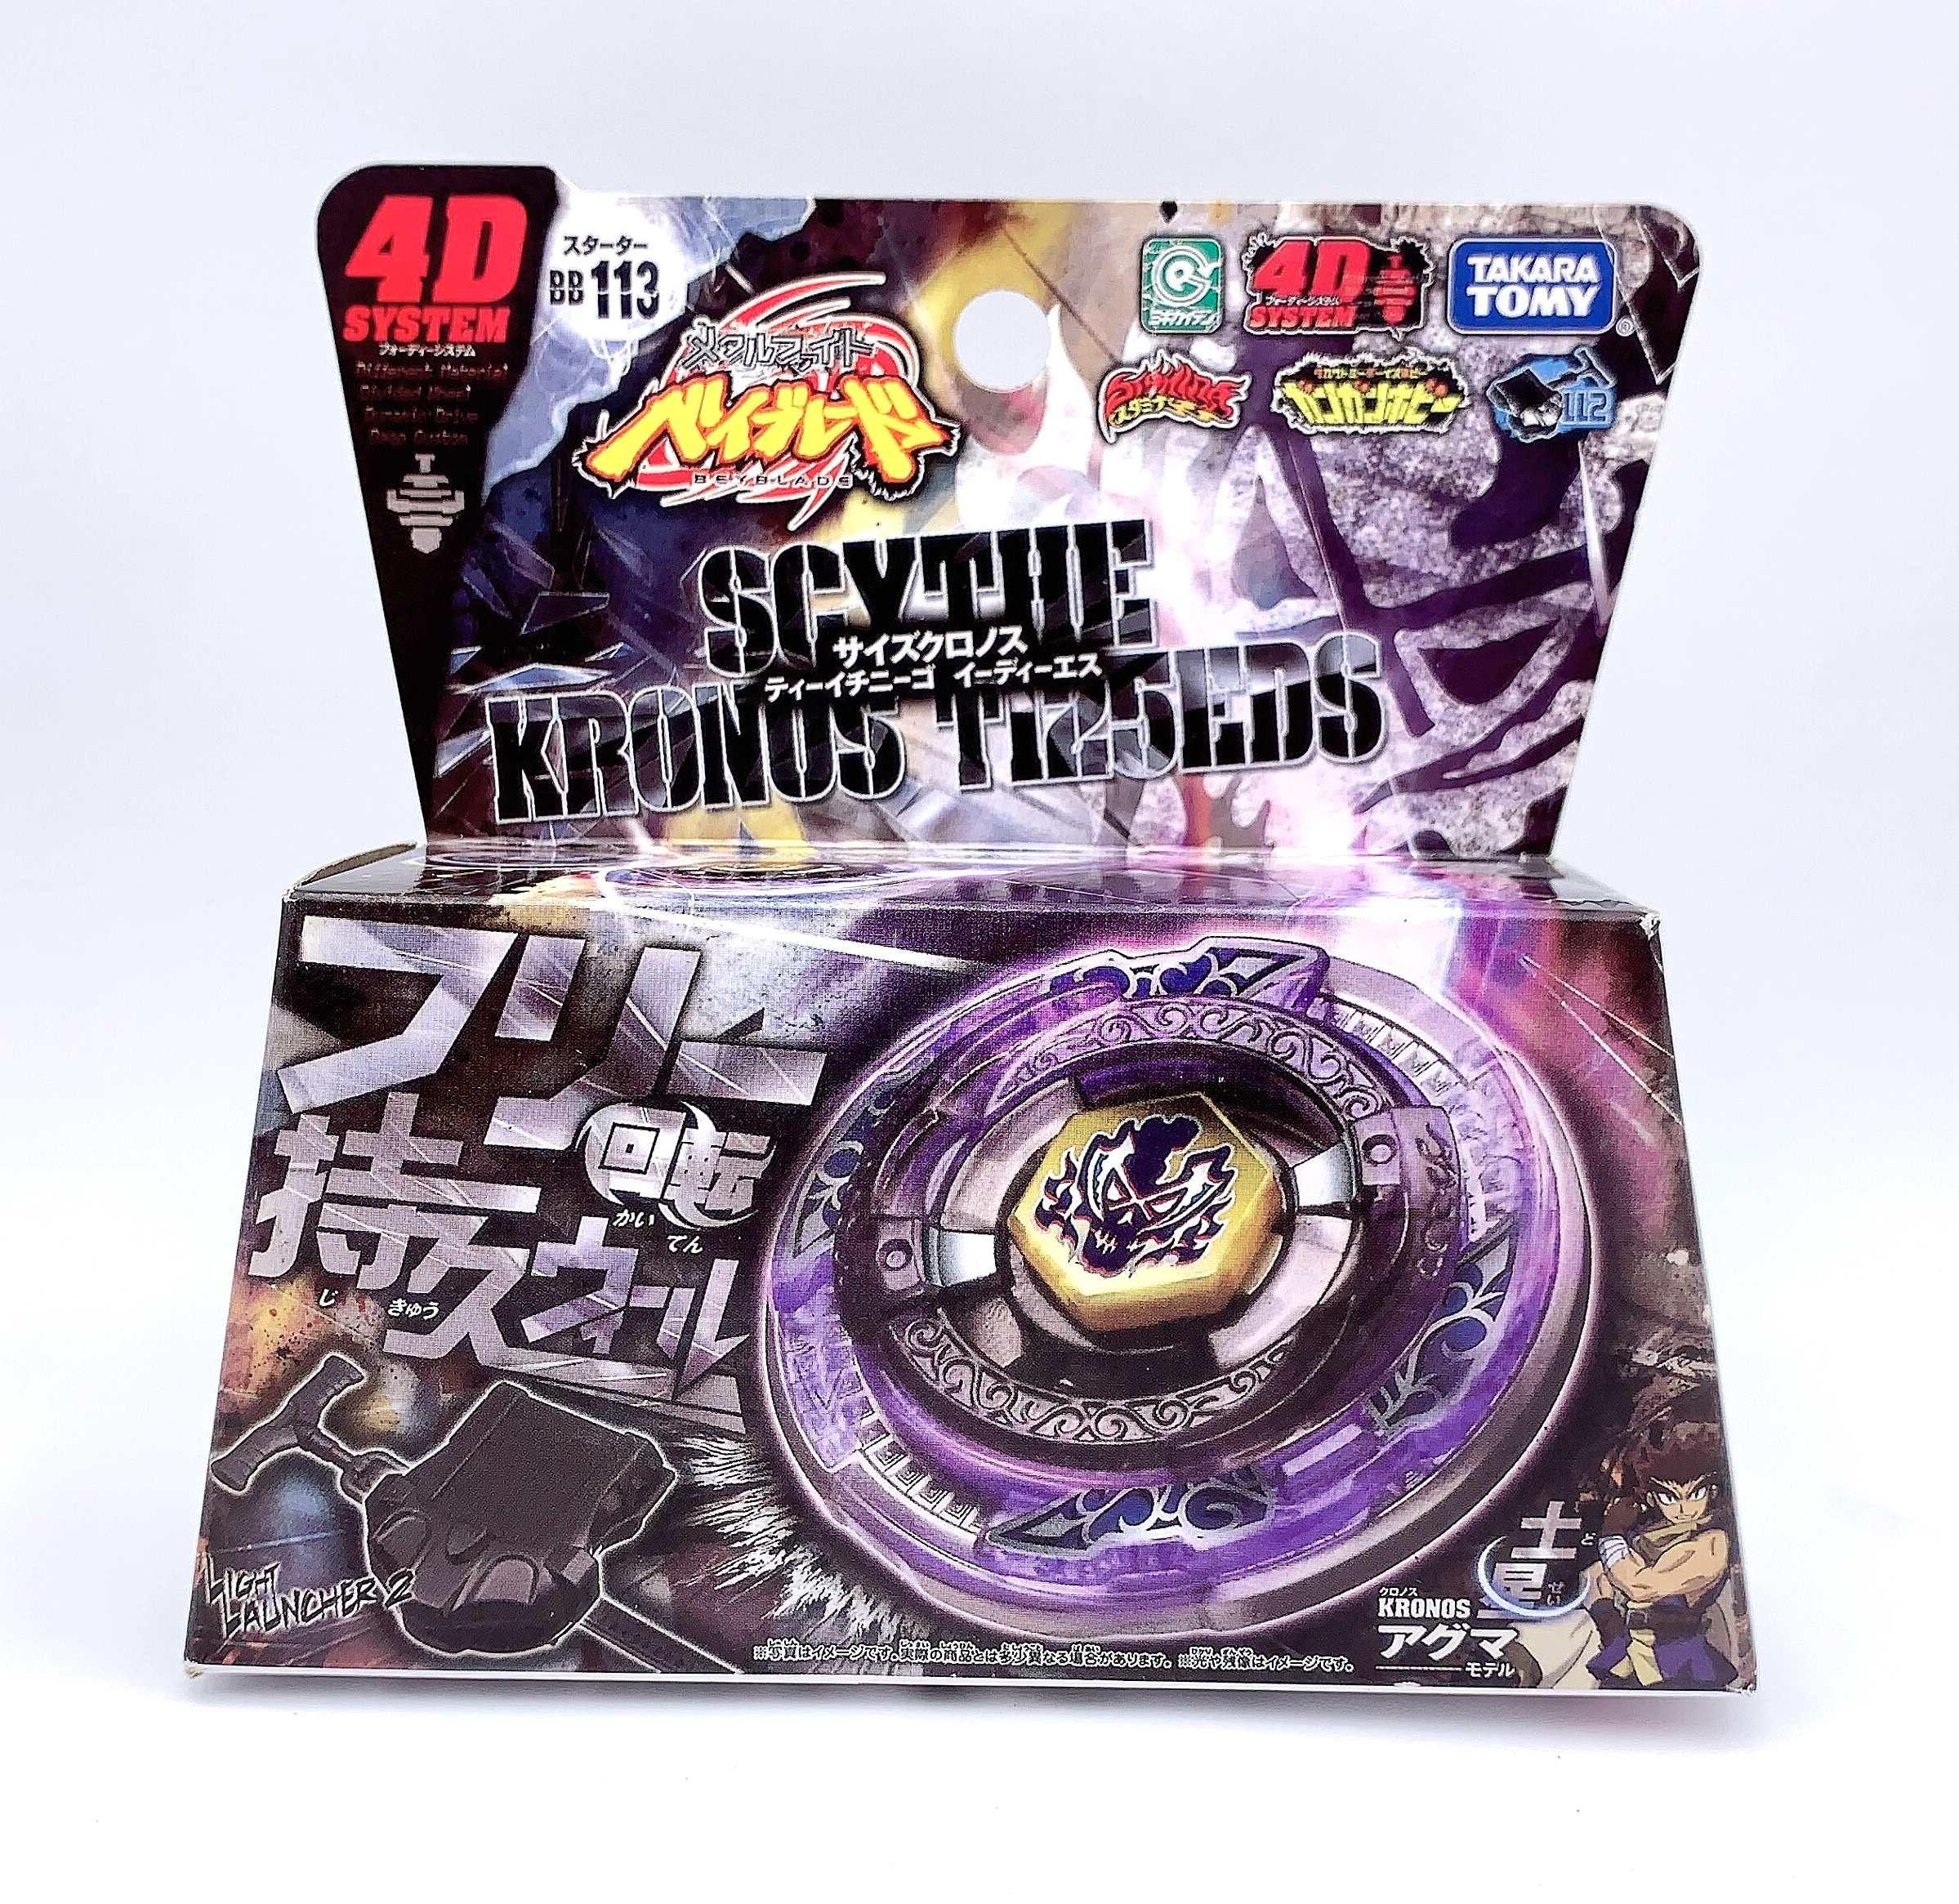 100% takara tomy beyblade BB113 Metal Fusion Starter Set Scythe Kronos as children's day toys